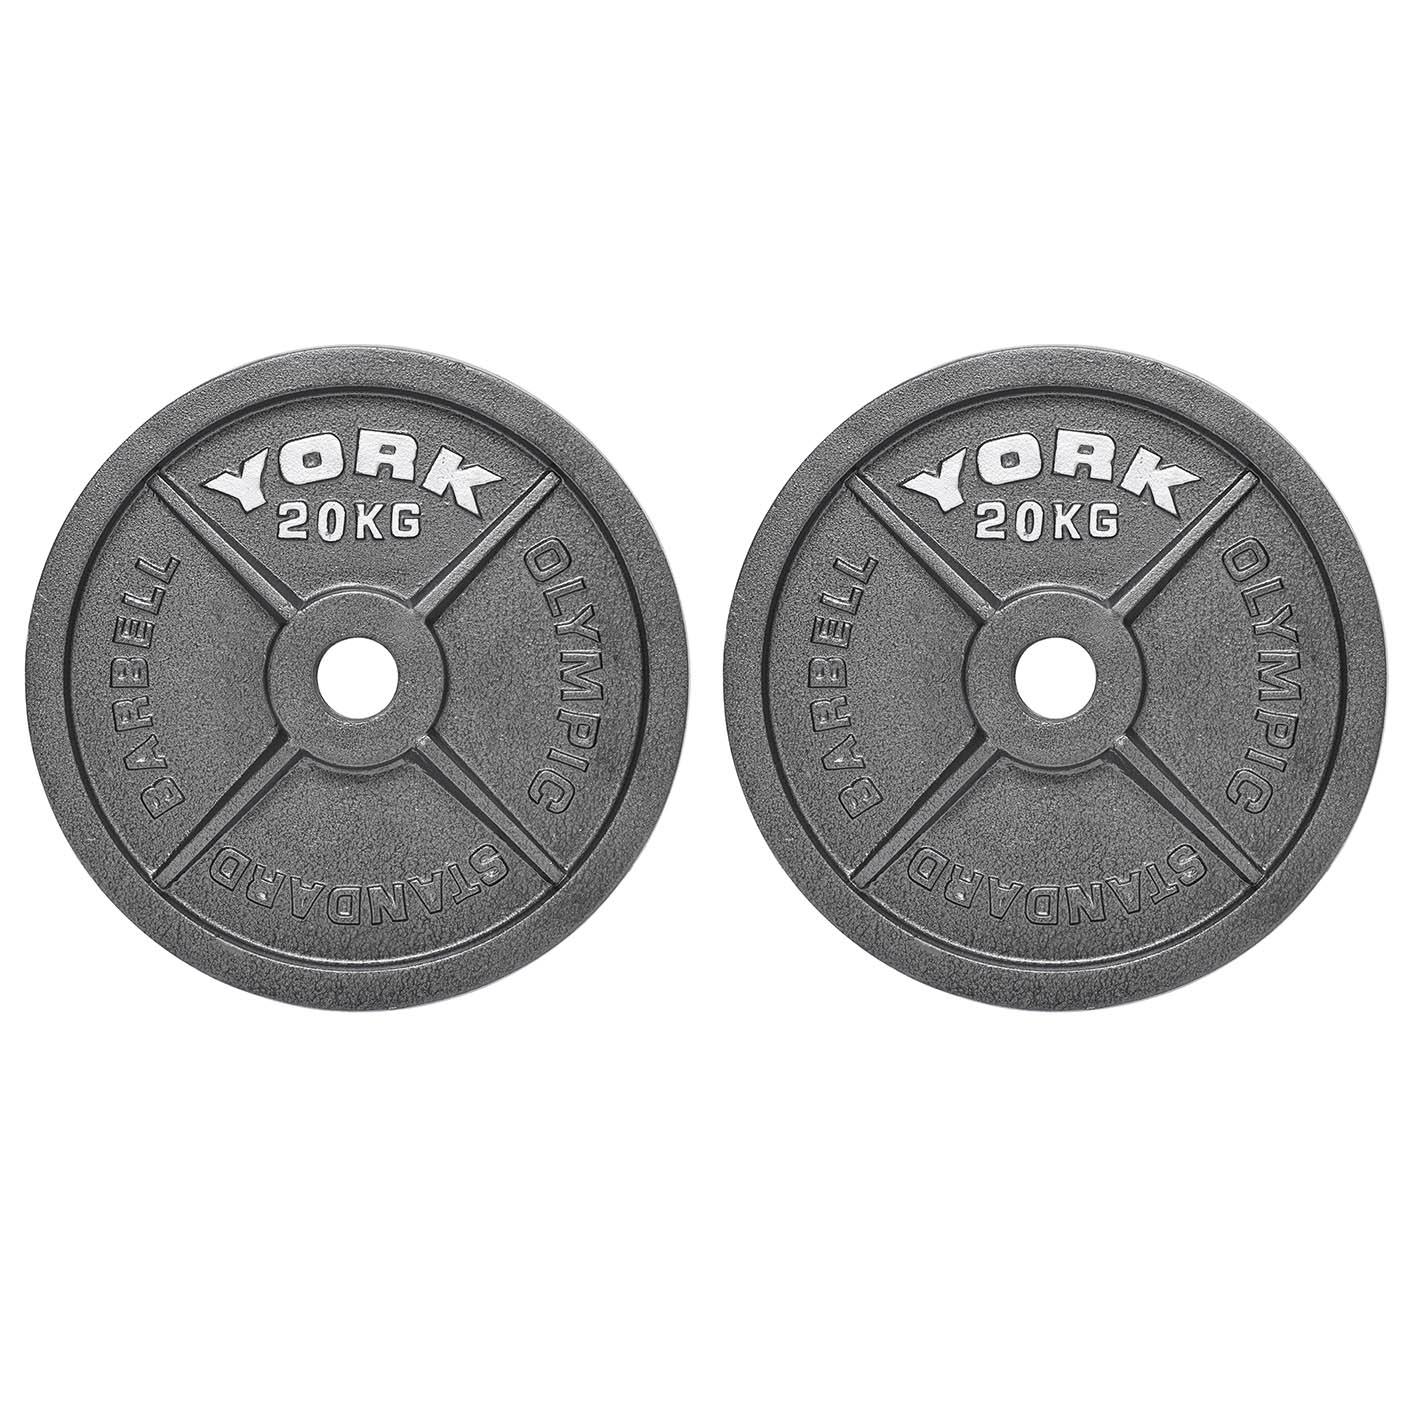 York 2 x 20kg Hammertone Cast Iron Olympic Weight Plates